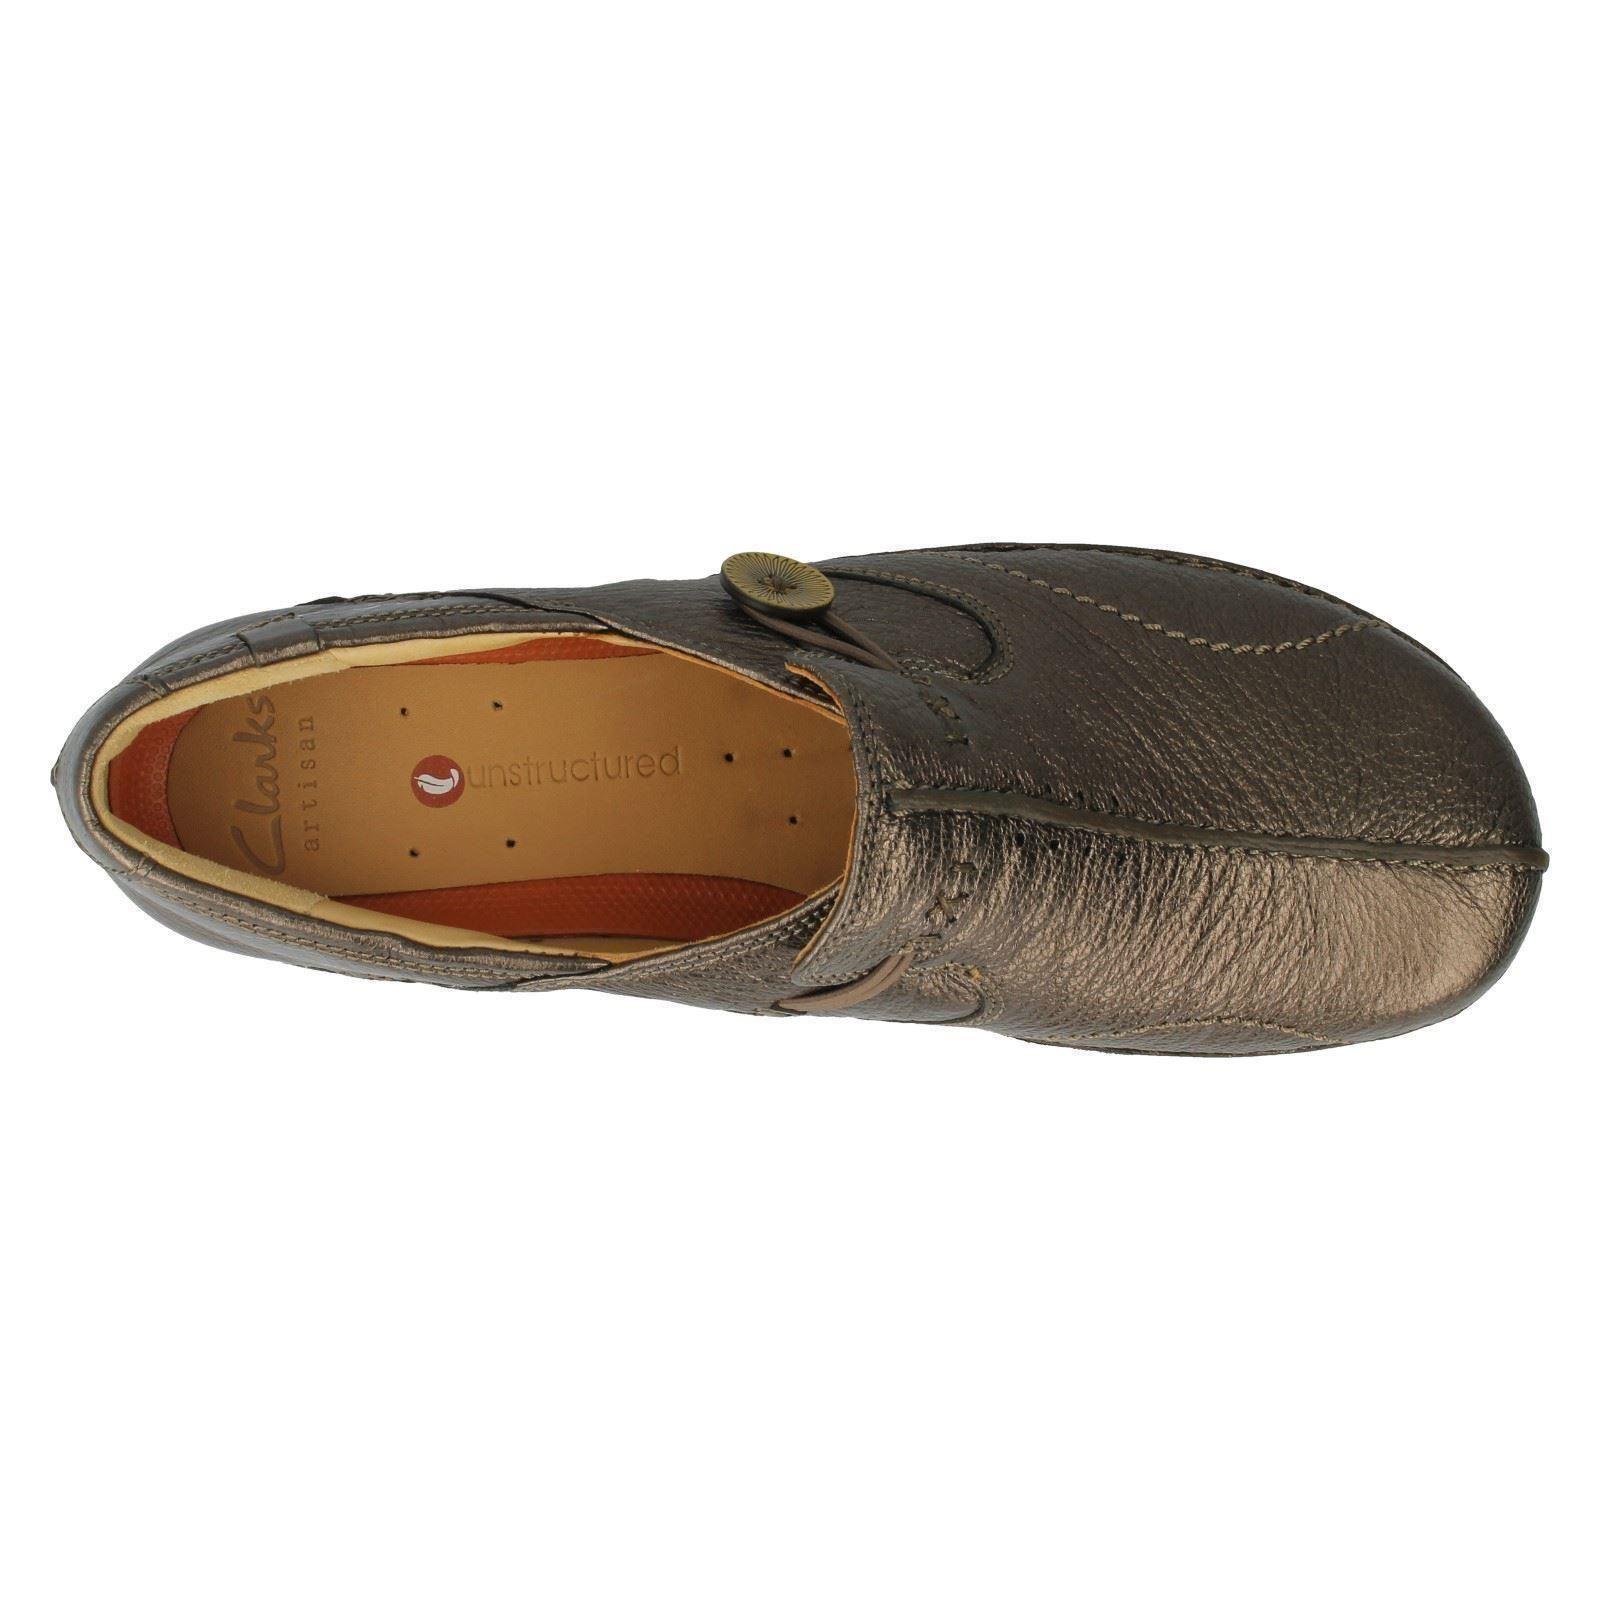 Clarks Un Loop Black Leather Flat Slip On Shoes